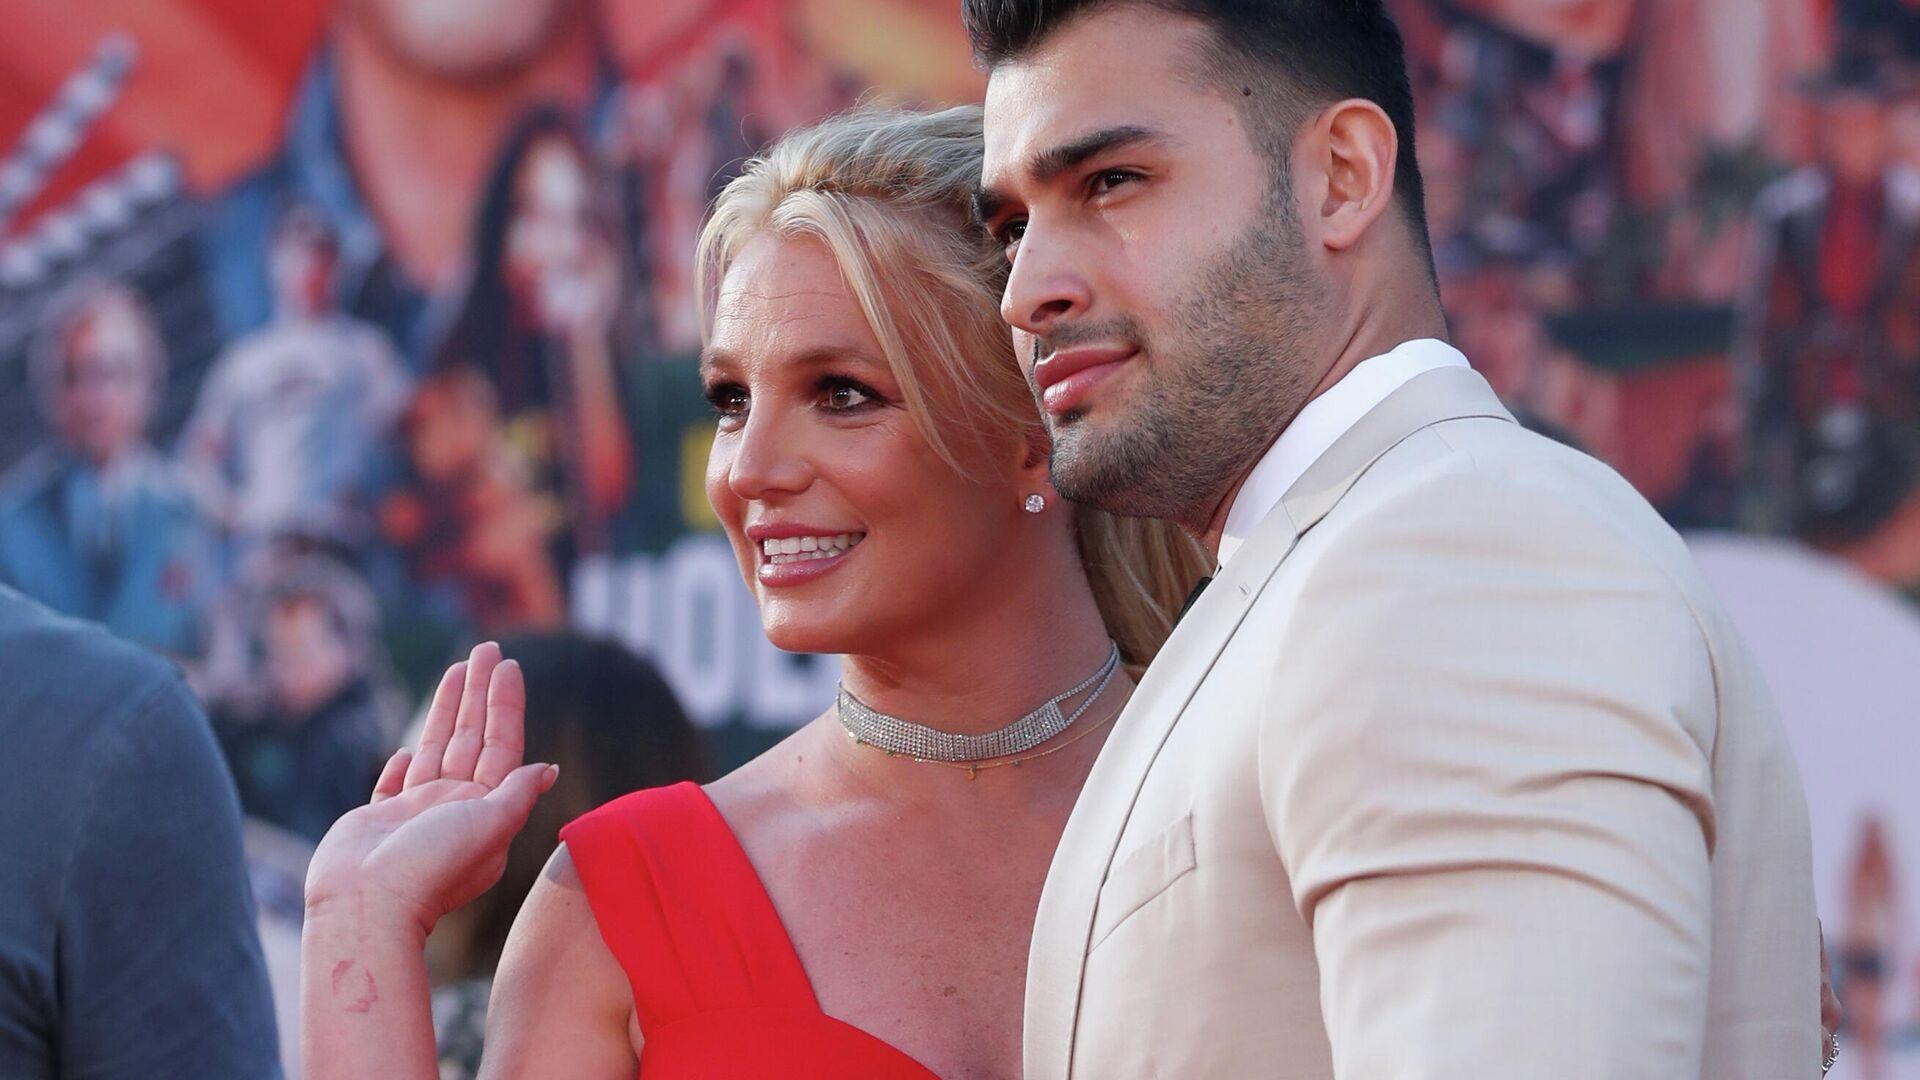 Britney Spears y su novio Sam Asghari - Sputnik Mundo, 1920, 13.09.2021